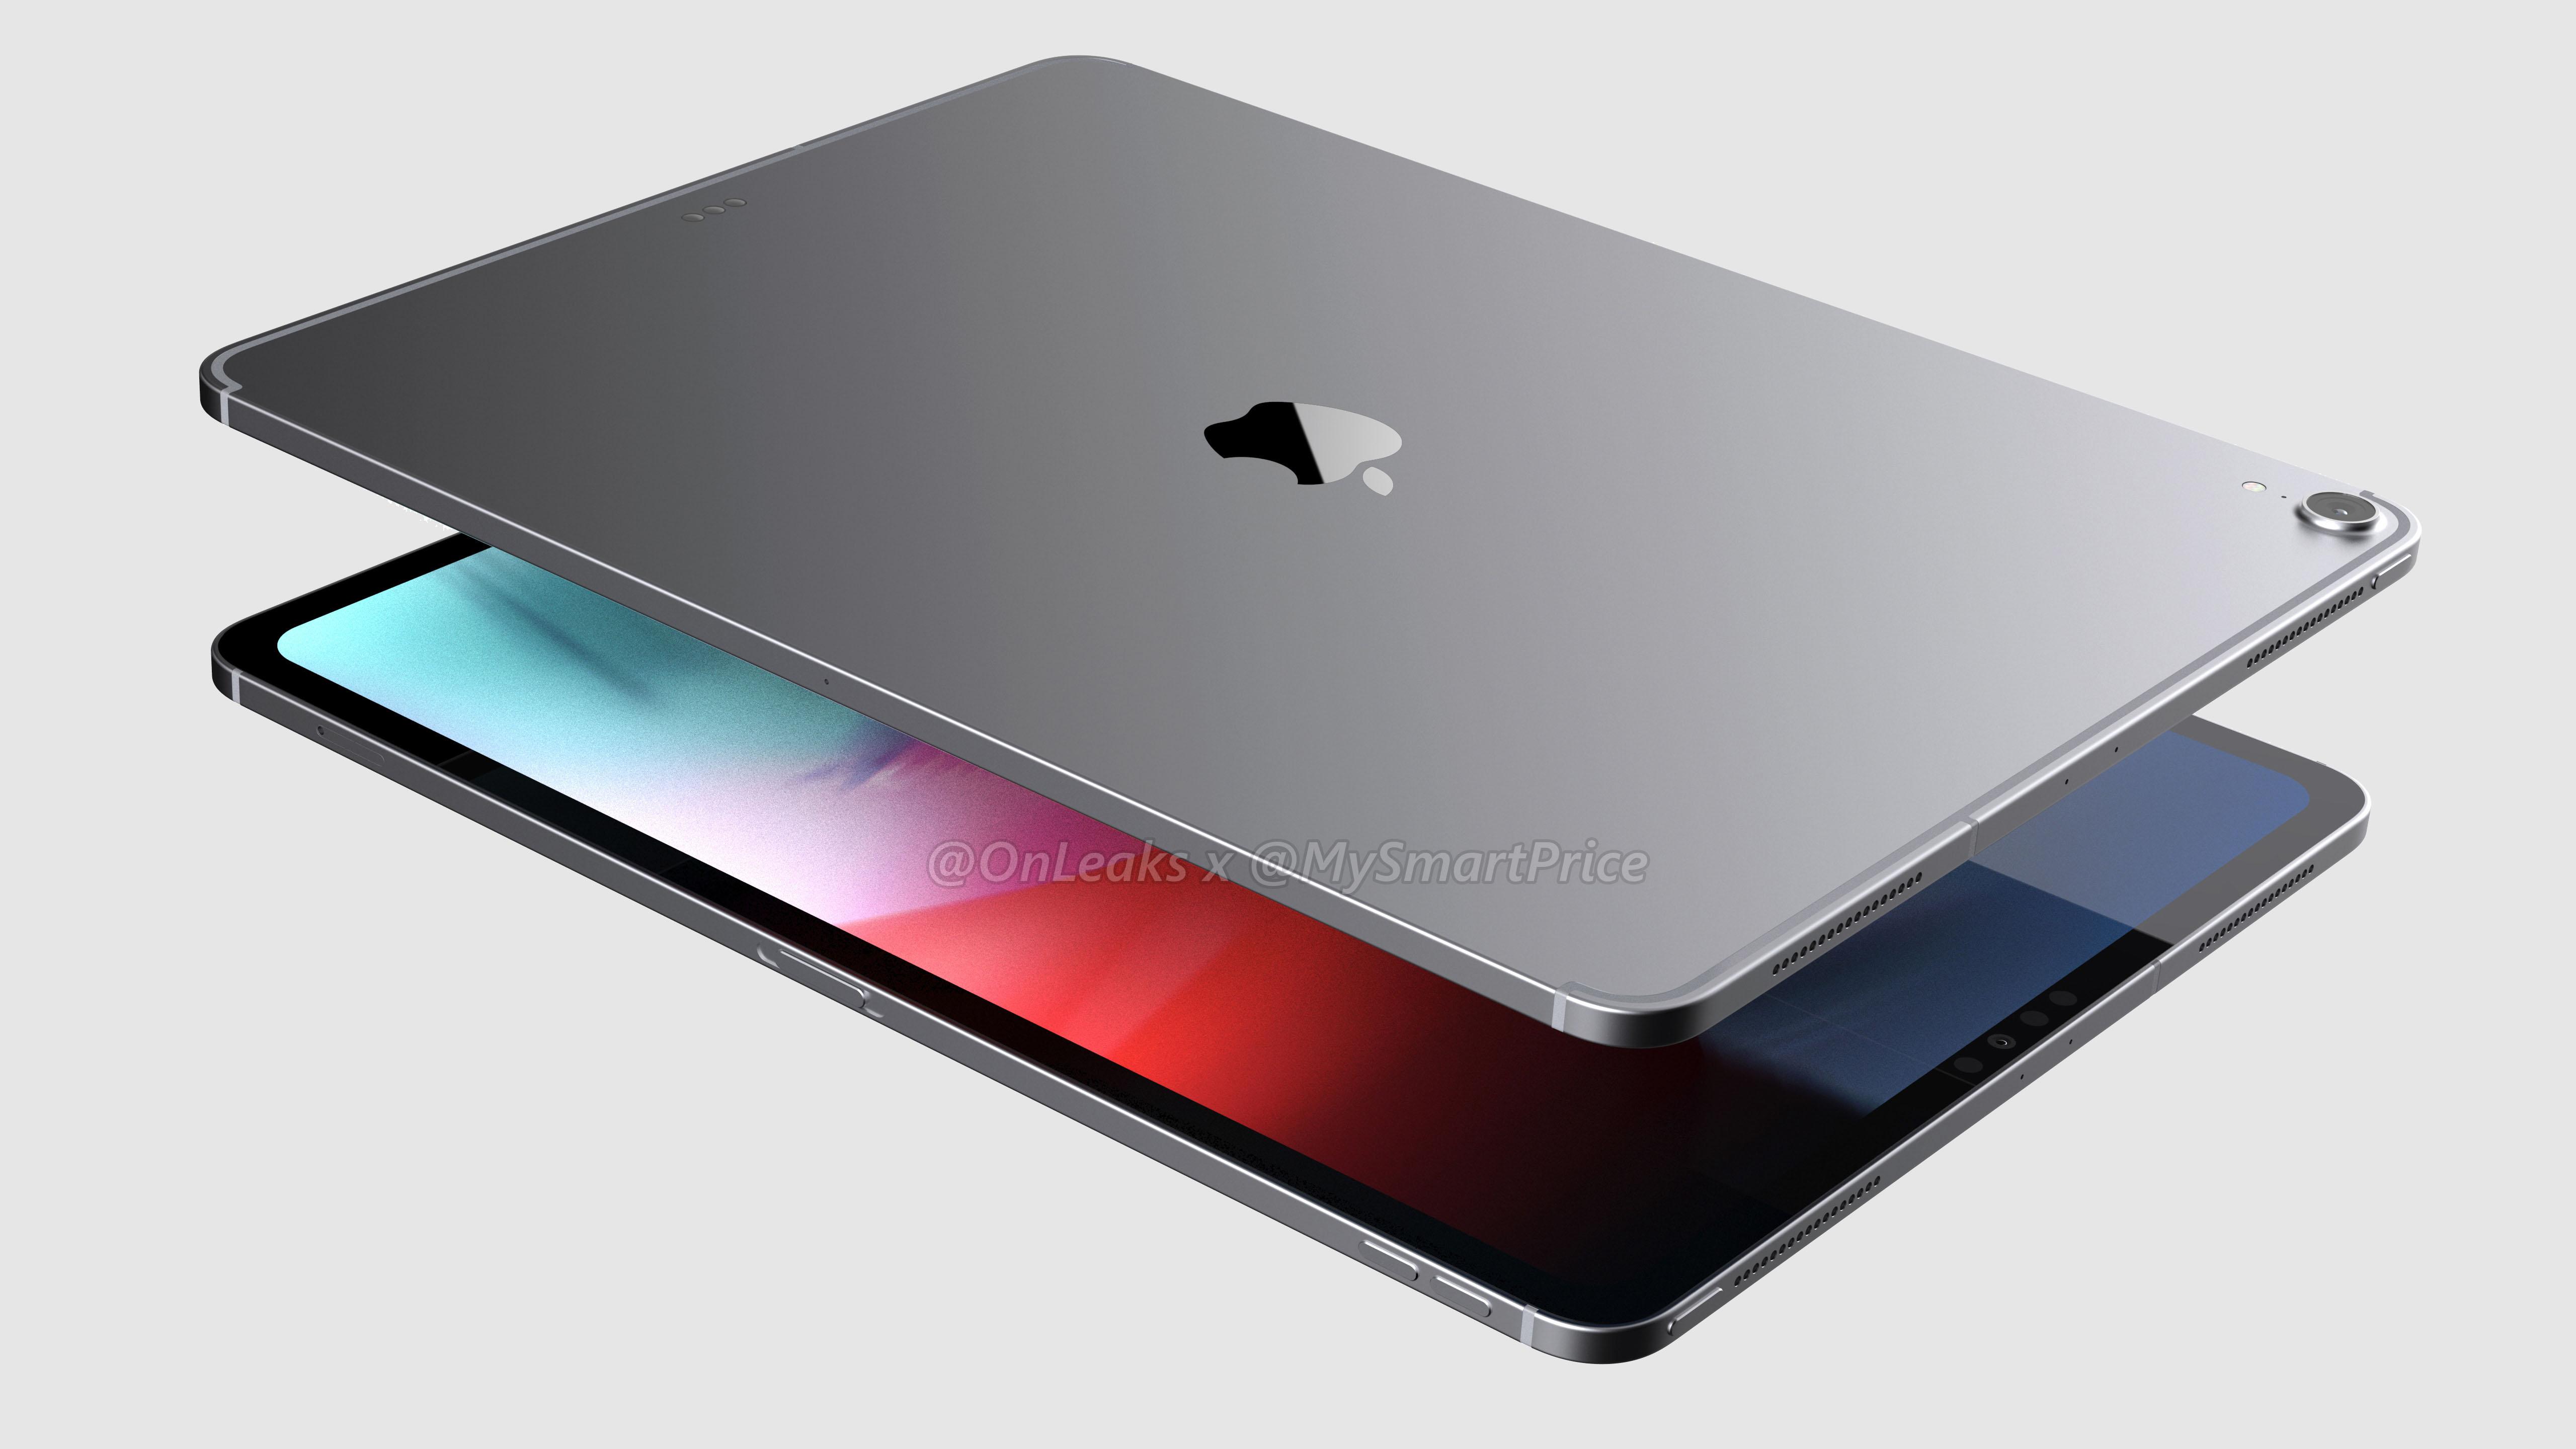 renders 12.9-inch iPad Pro 2018